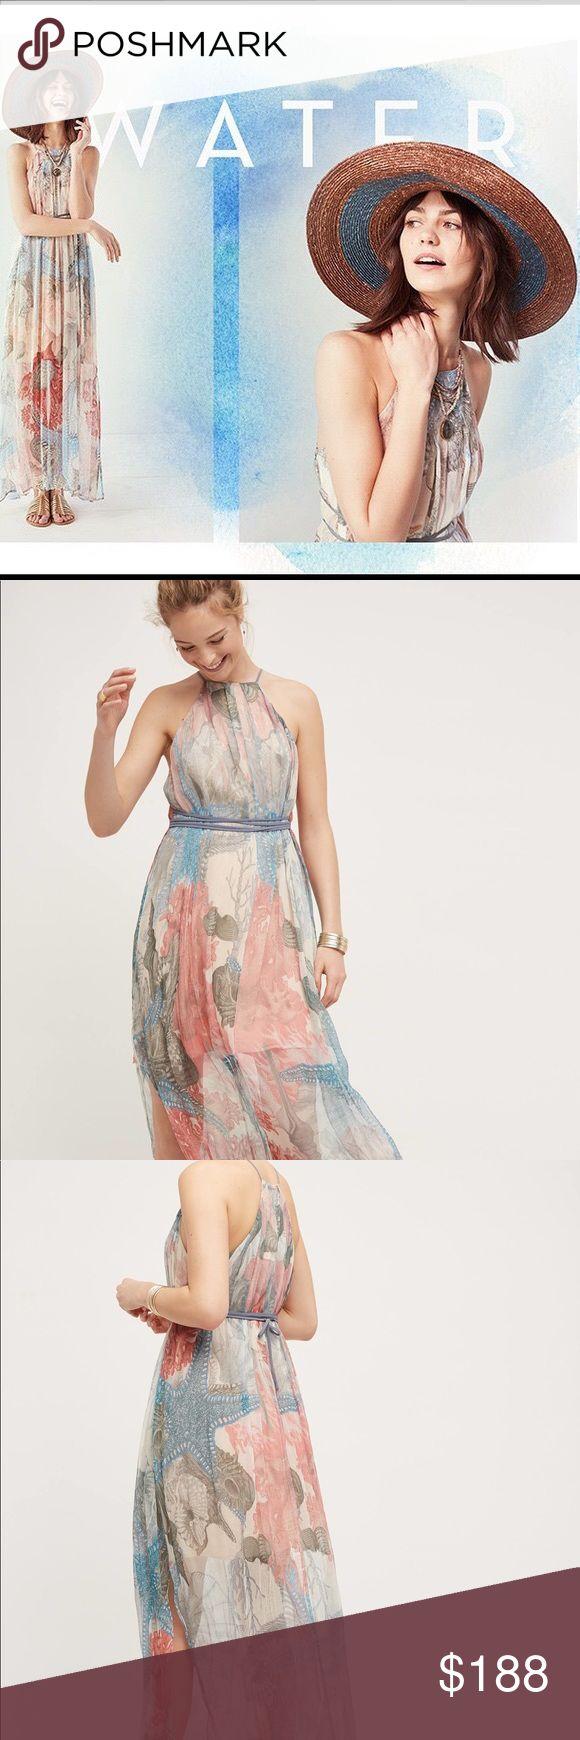 Comingsoon: Anthropologie Sea Star Silk Maxi Dress Stunning silk chiffon- like maxi dress by Moulinette Soeurs for Anthropologie 😍😍😍 Anthropologie Dresses Maxi